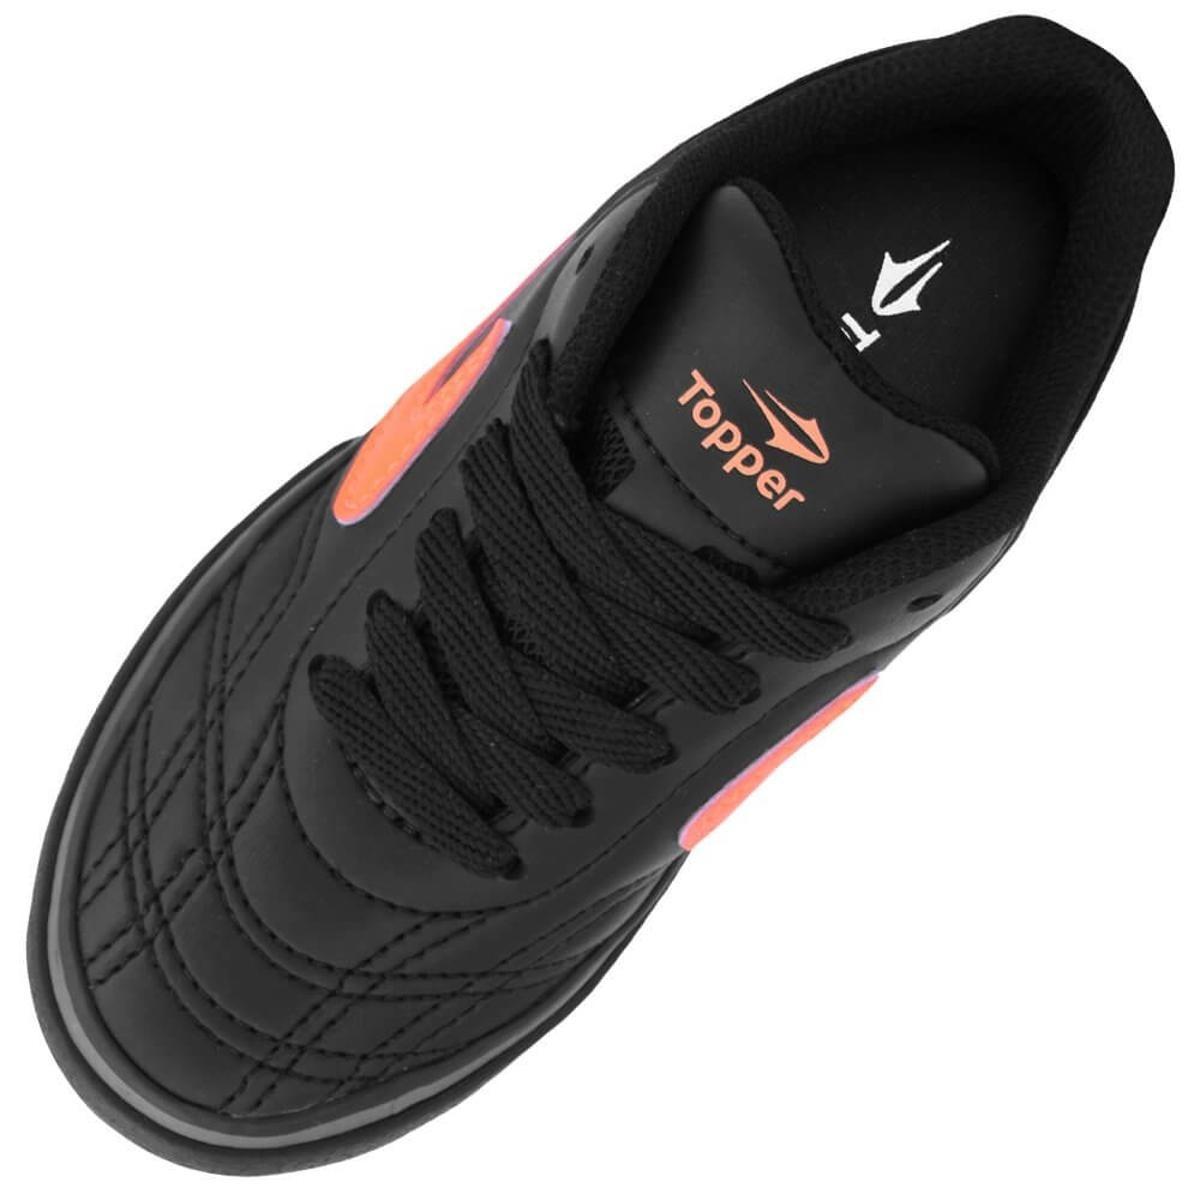 f0acaeb96a68e Chuteira Topper Dominator Futsal Jr. Infantil. - 02897 - R  120